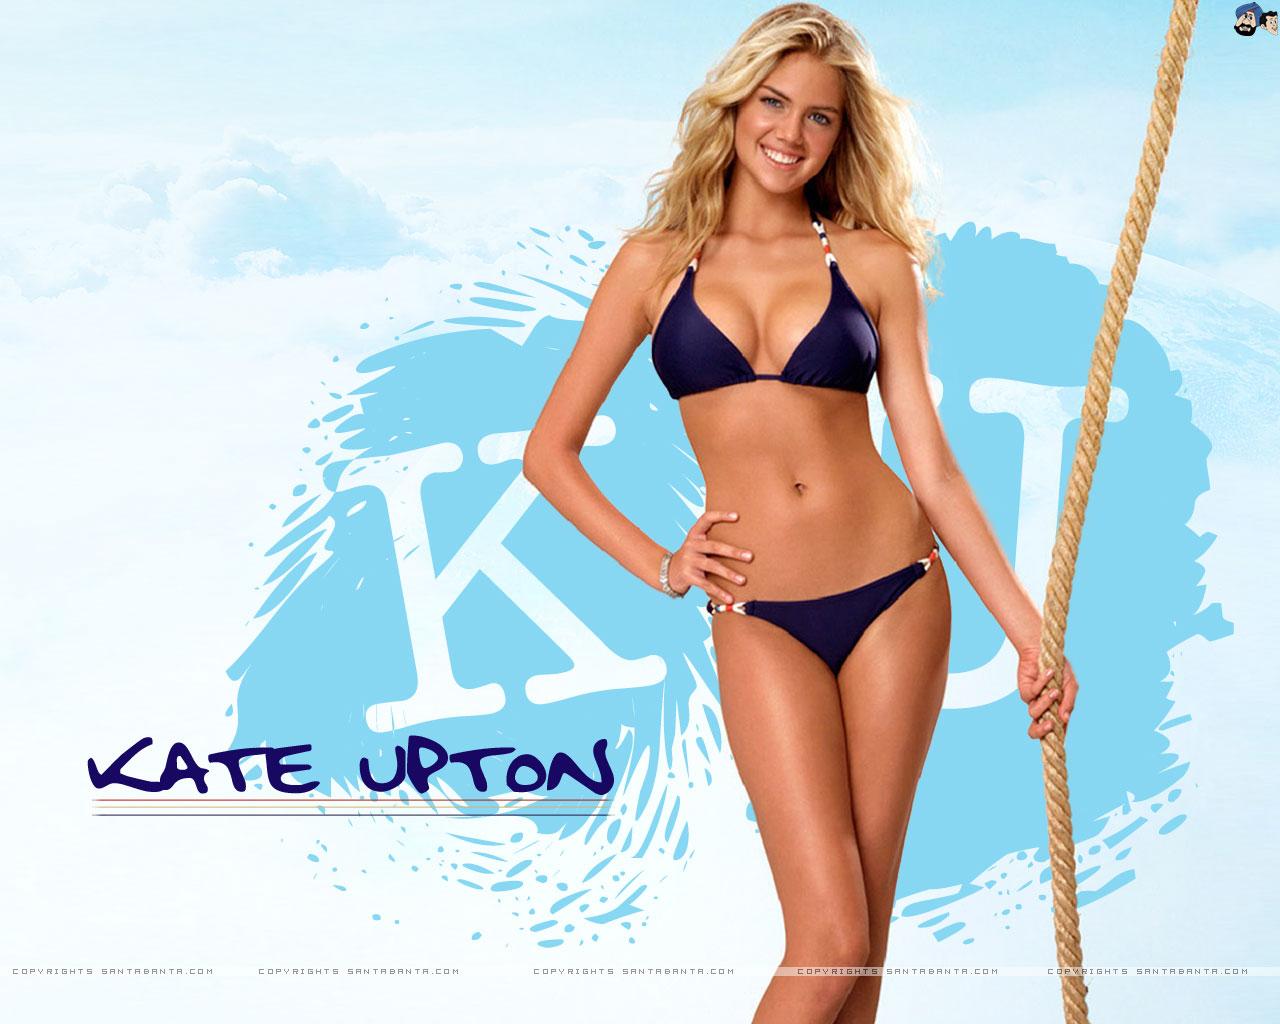 Kate Upton kate upton